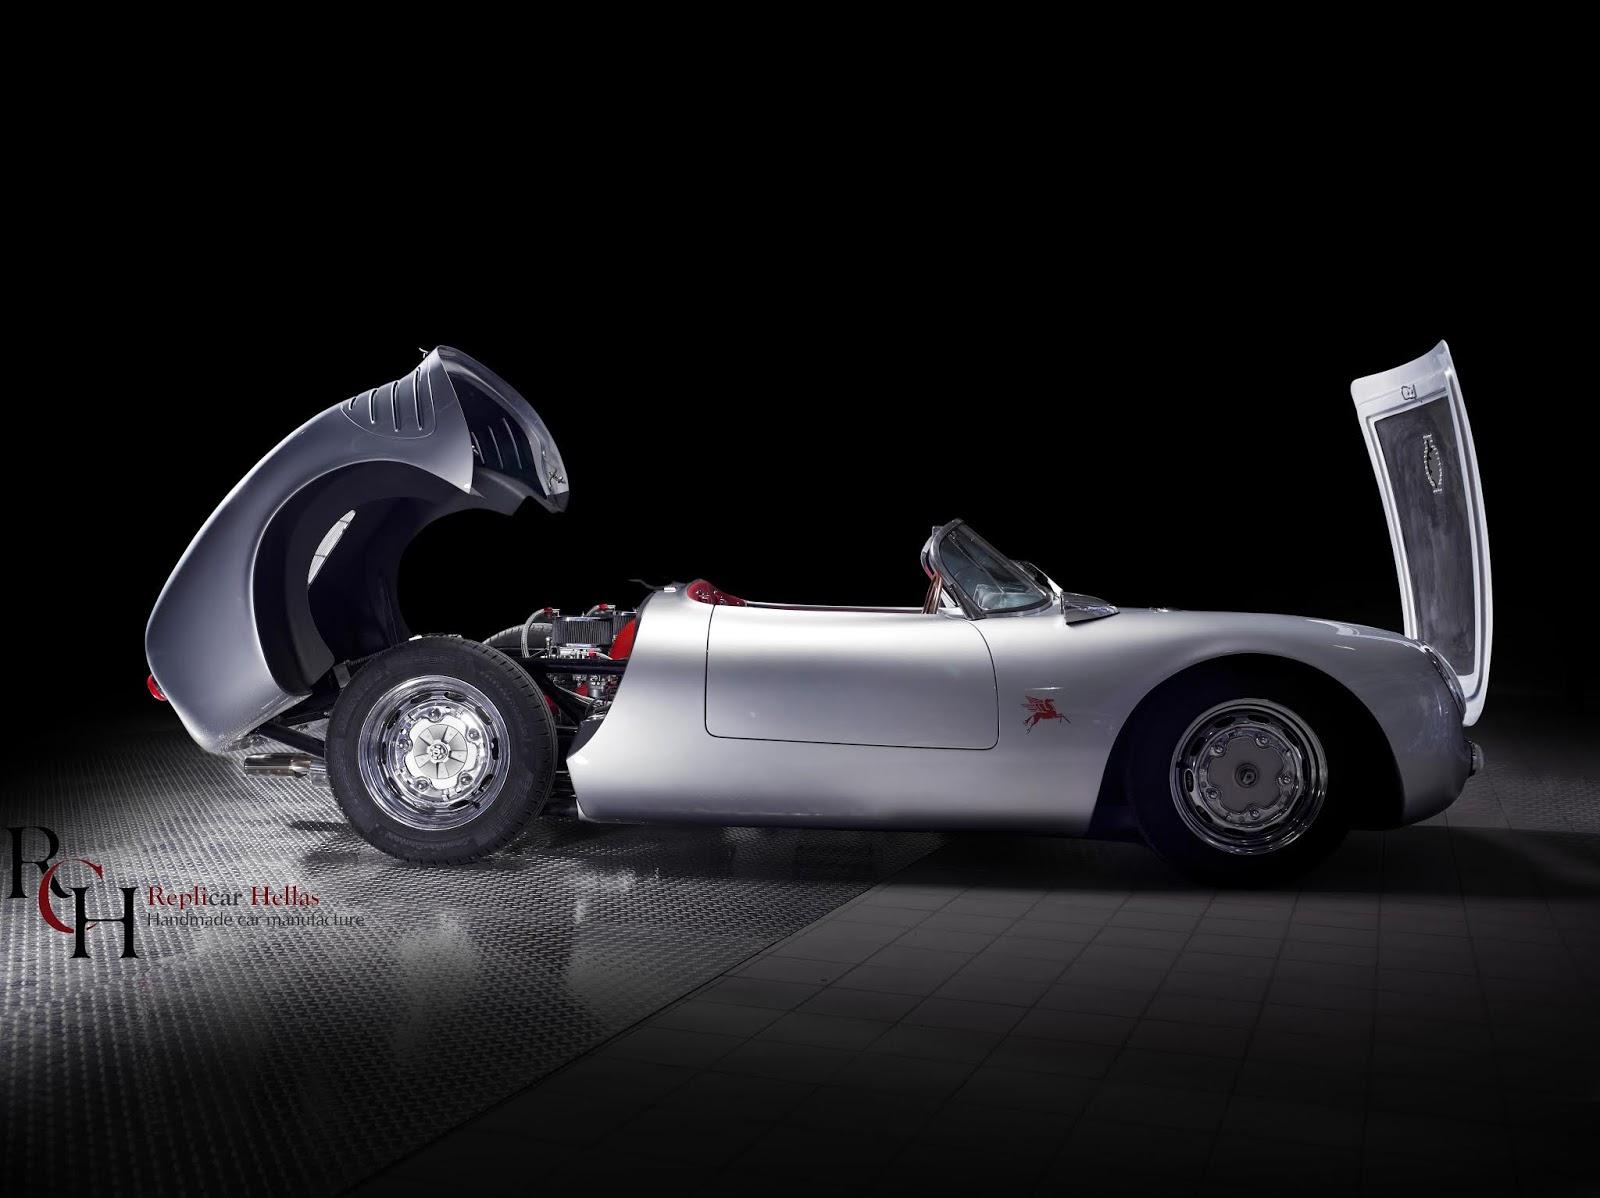 Replicar 11 05 132B55011 Ελληνικά αυτοκίνητα στο Σαλόνι της Γενεύης! Έκθεση, Έκθεση Γενεύης, ελληνικό αυτοκίνητο, Σαλόνι Αυτοκινήτου, Σαλόνι Αυτοκινήτου της Γενεύης